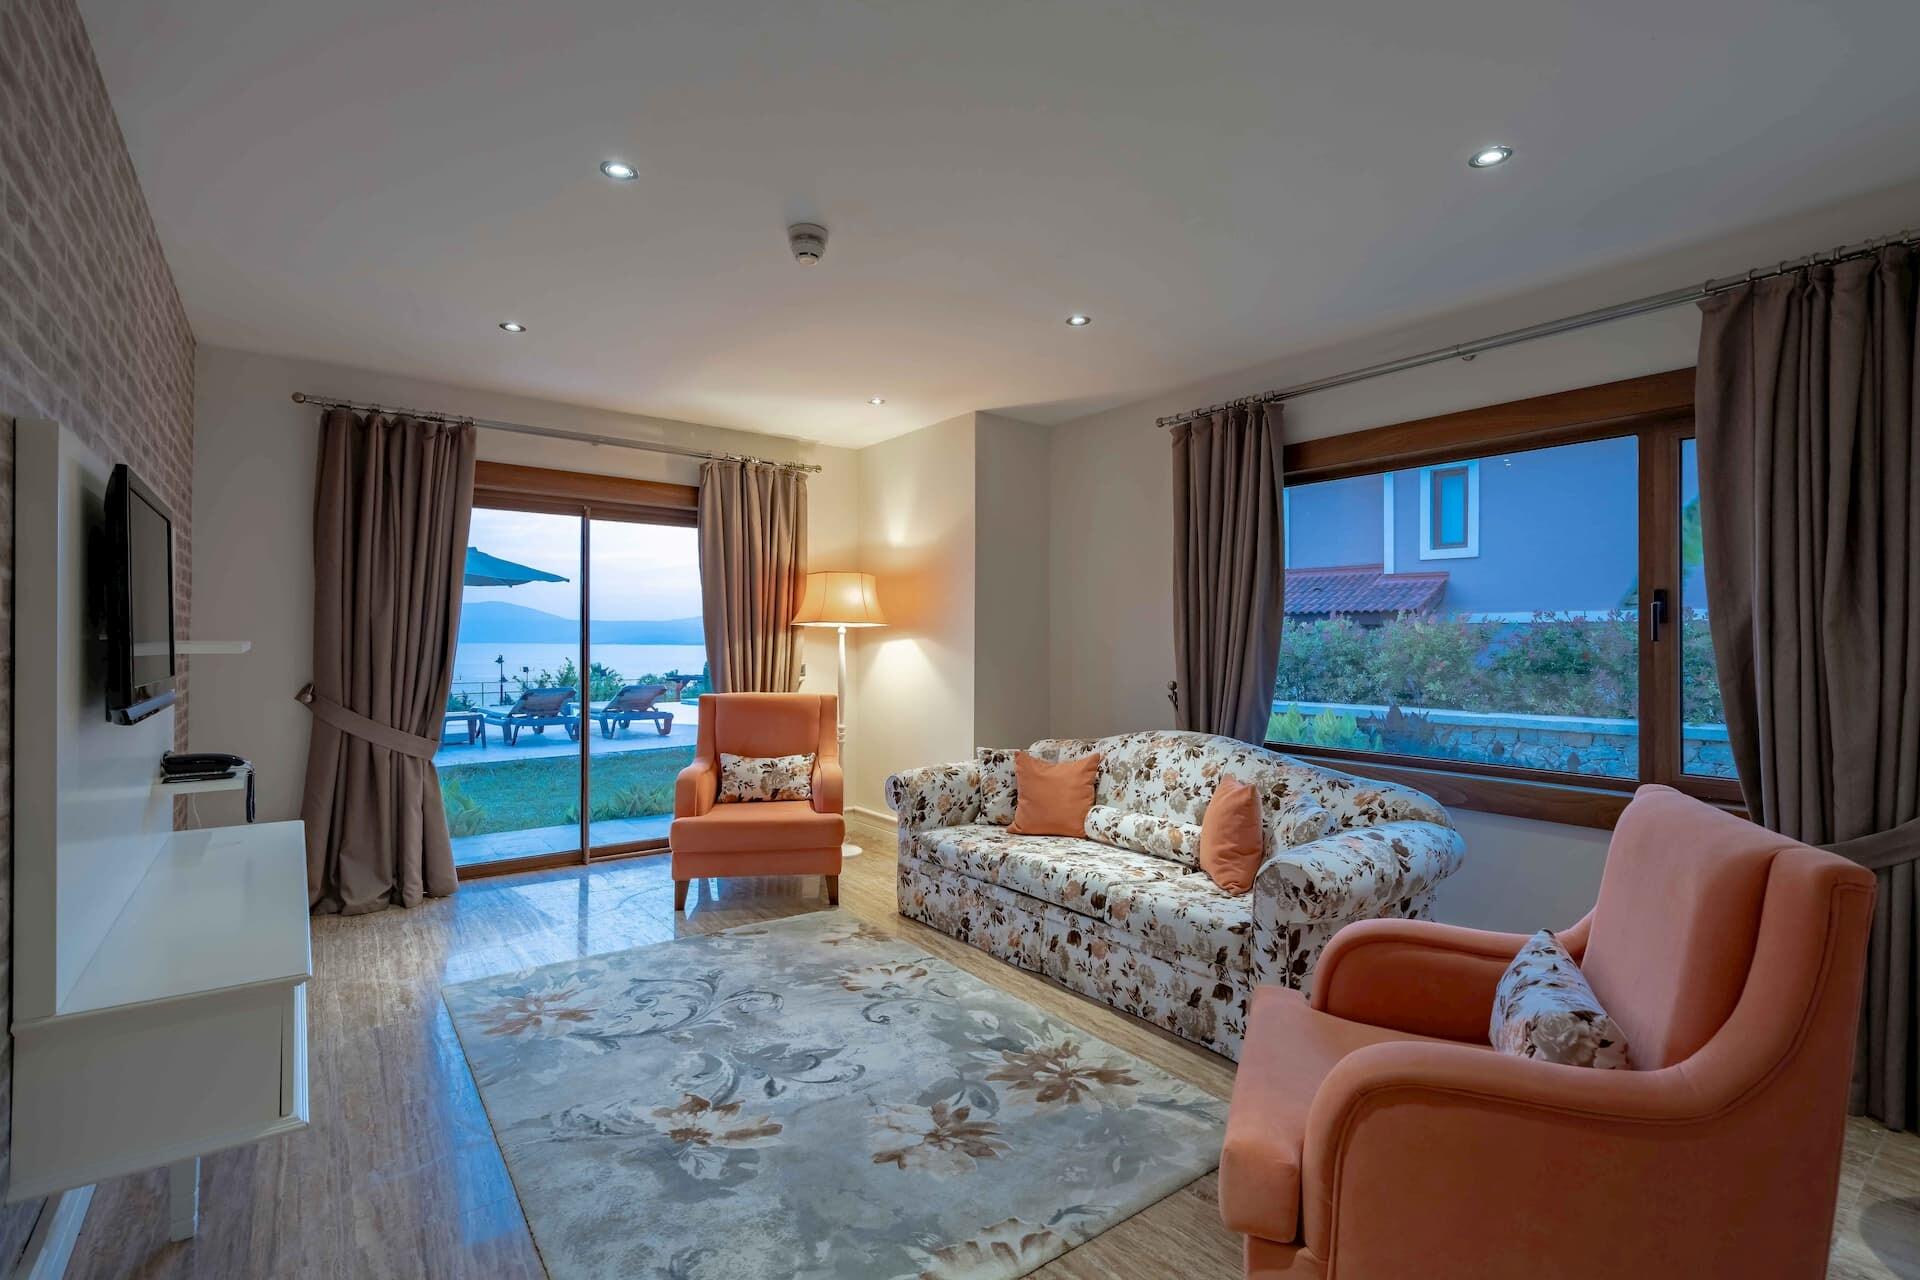 EUPHORIA AEGEAN RESORT AND THERMAL HOTEL – Executive Villa